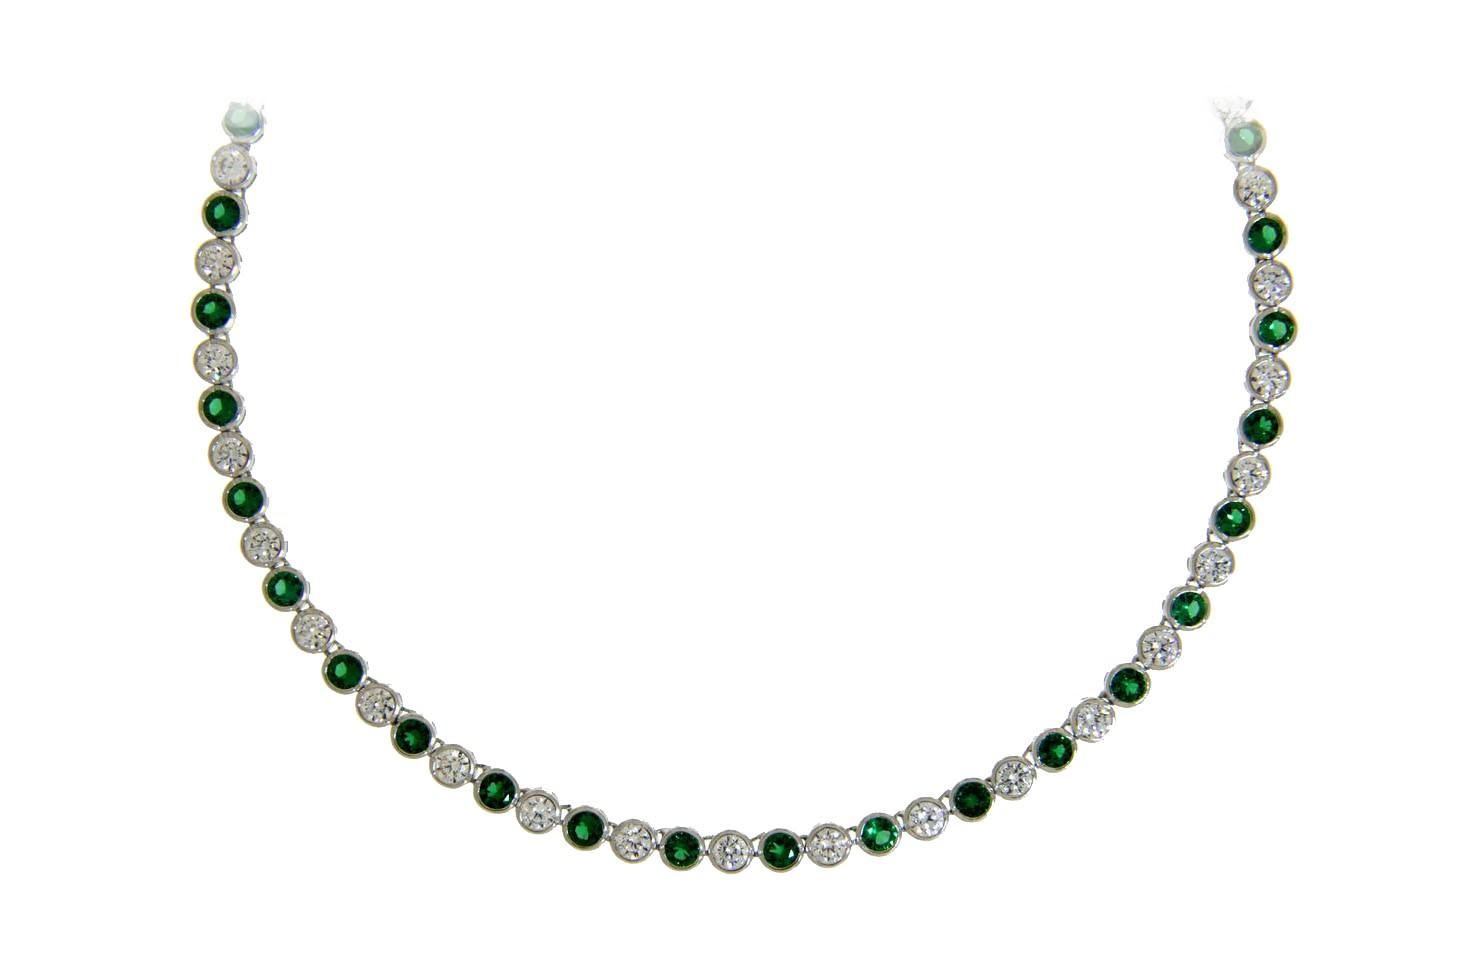 Collier Charlotte silber smaragd grün weiß frontal